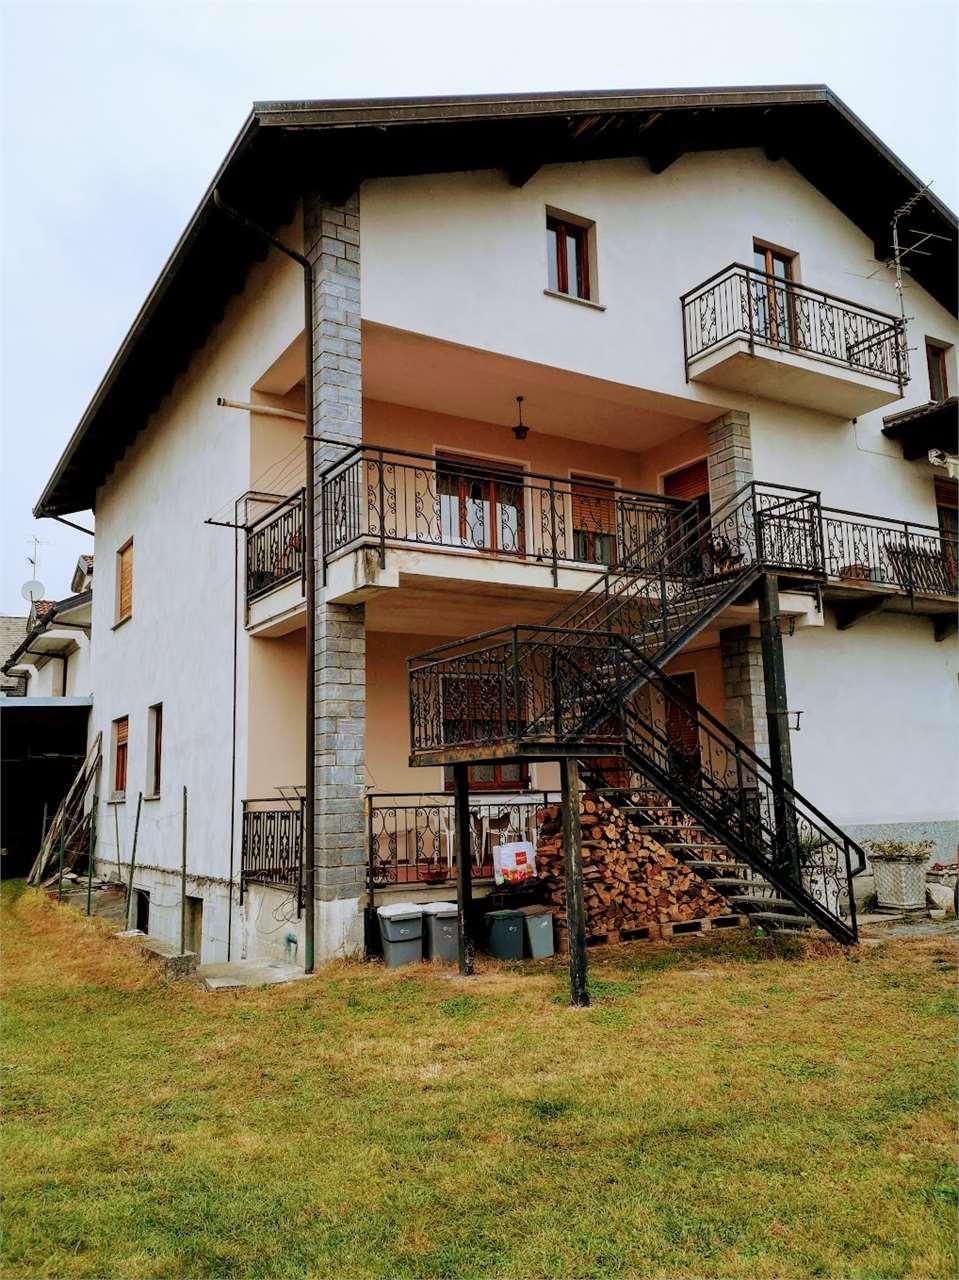 Vendita Casa Indipendente Casa/Villa Masera via roma  114 252458